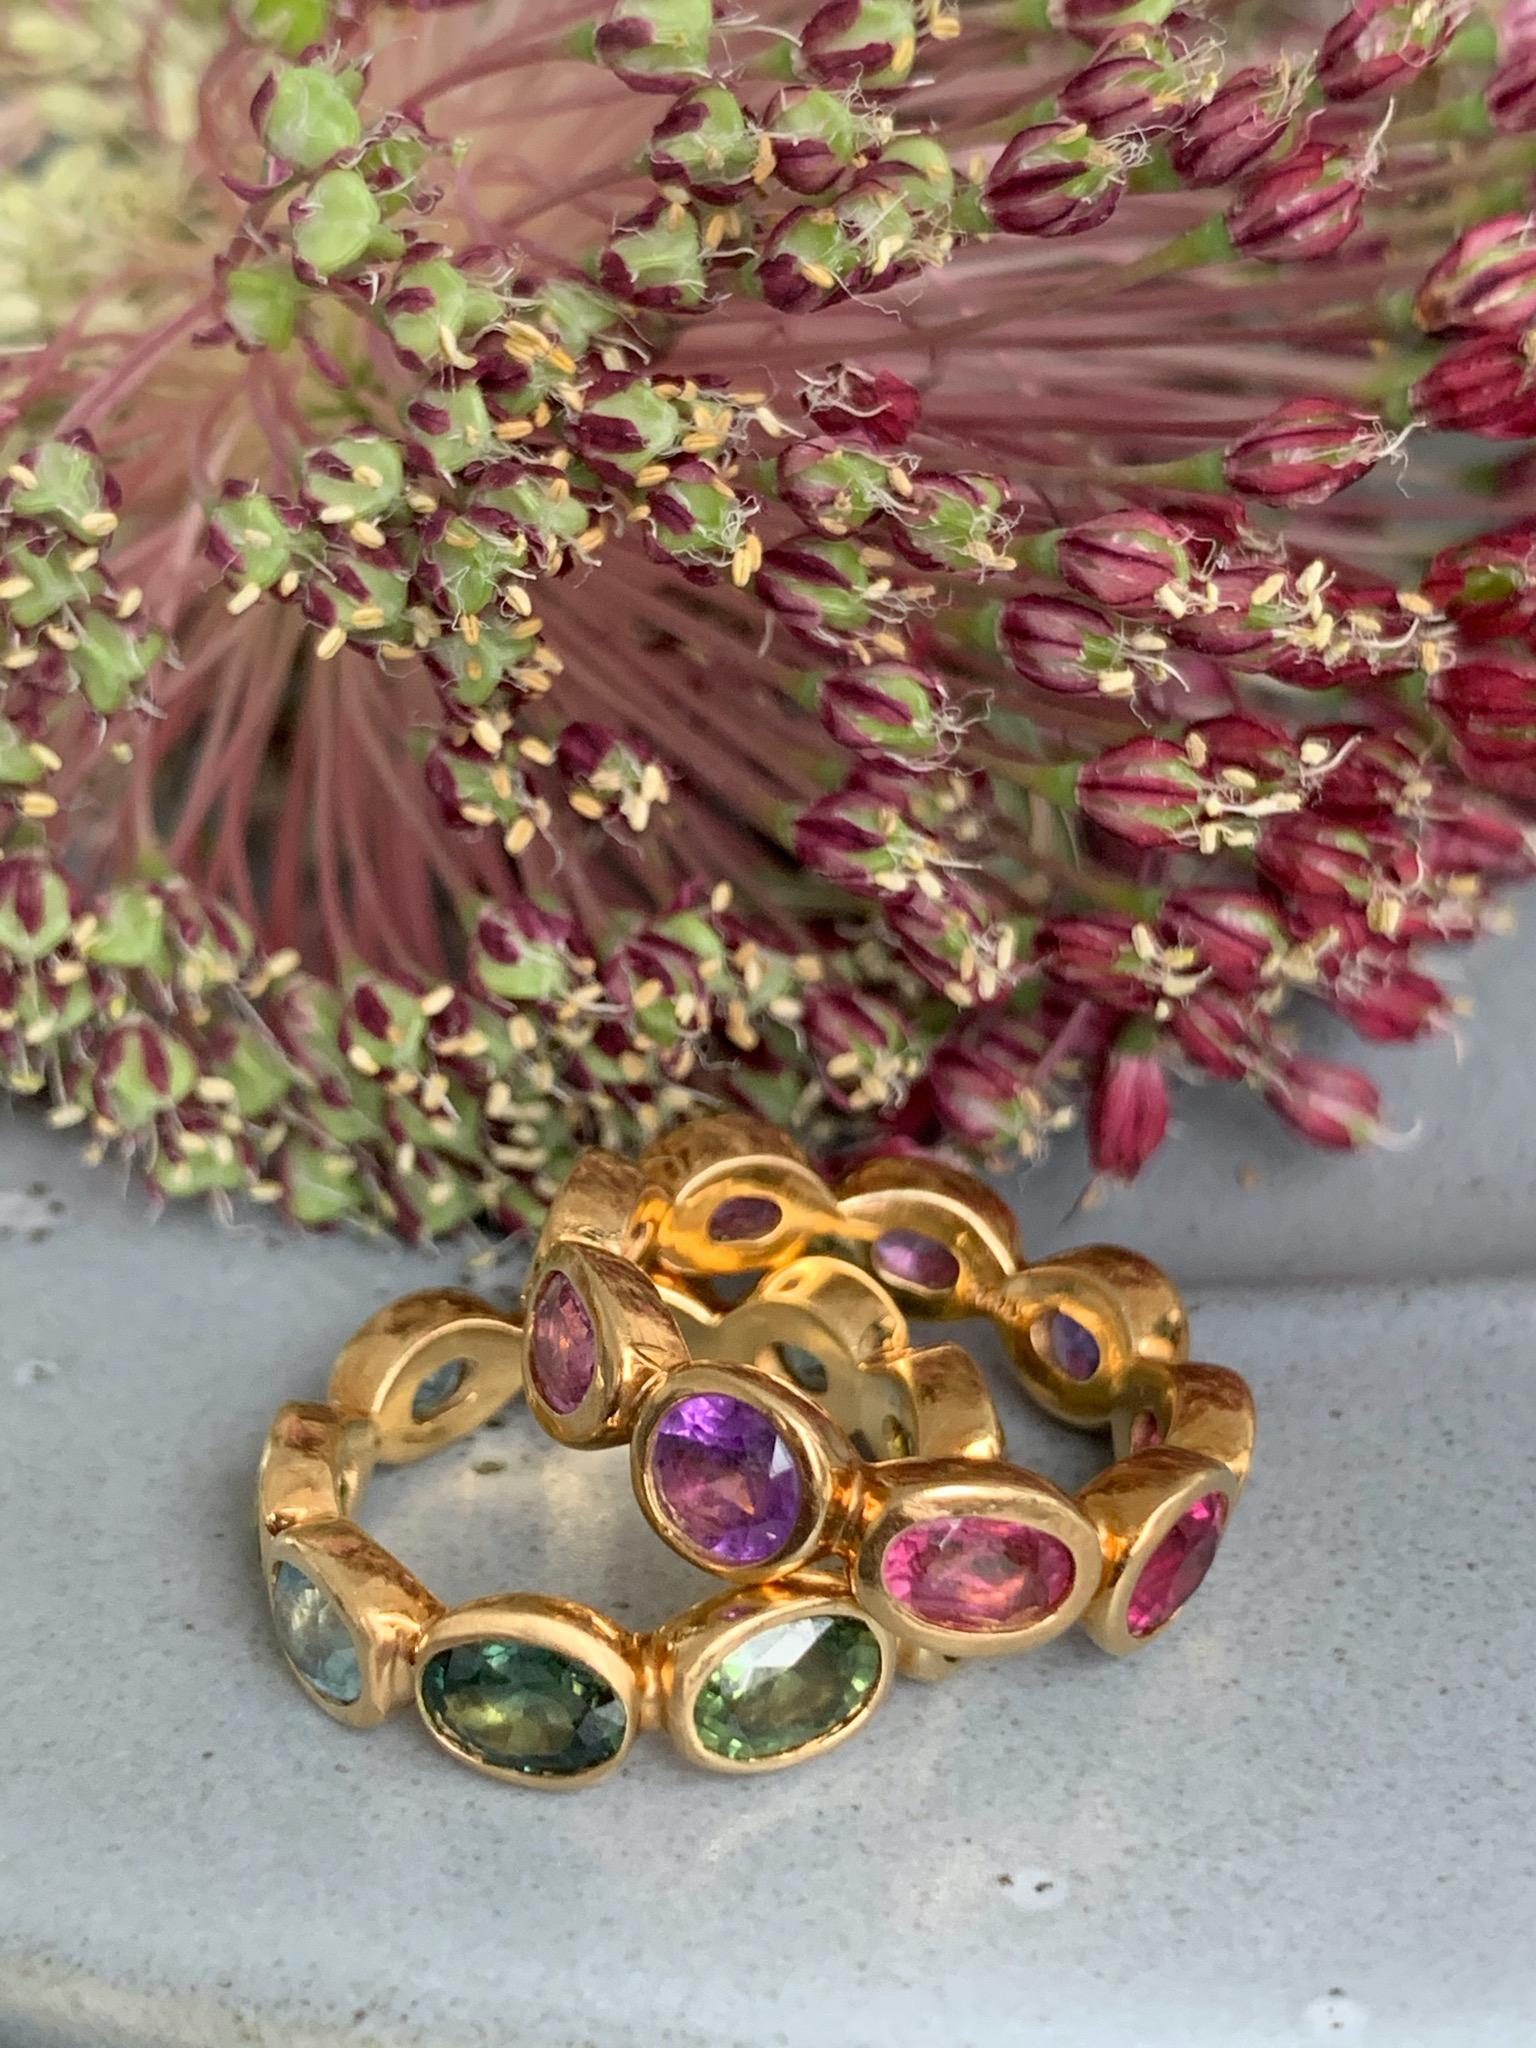 Mixed gemstones in rose gold